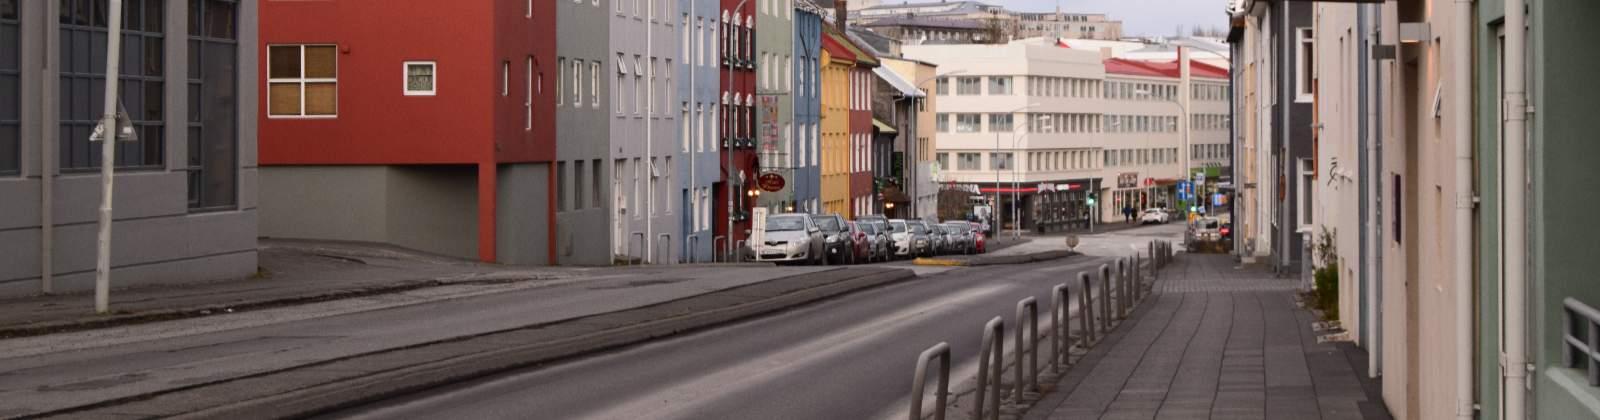 Reykjavik-tips